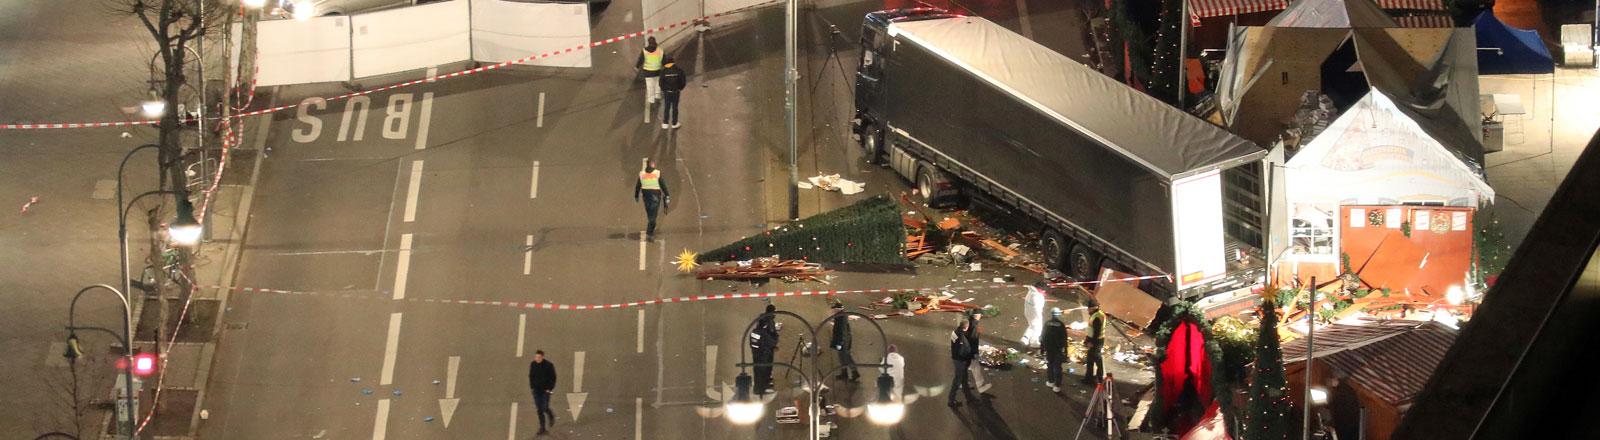 LKW rast in Weihnachtsmarkt in Berlin